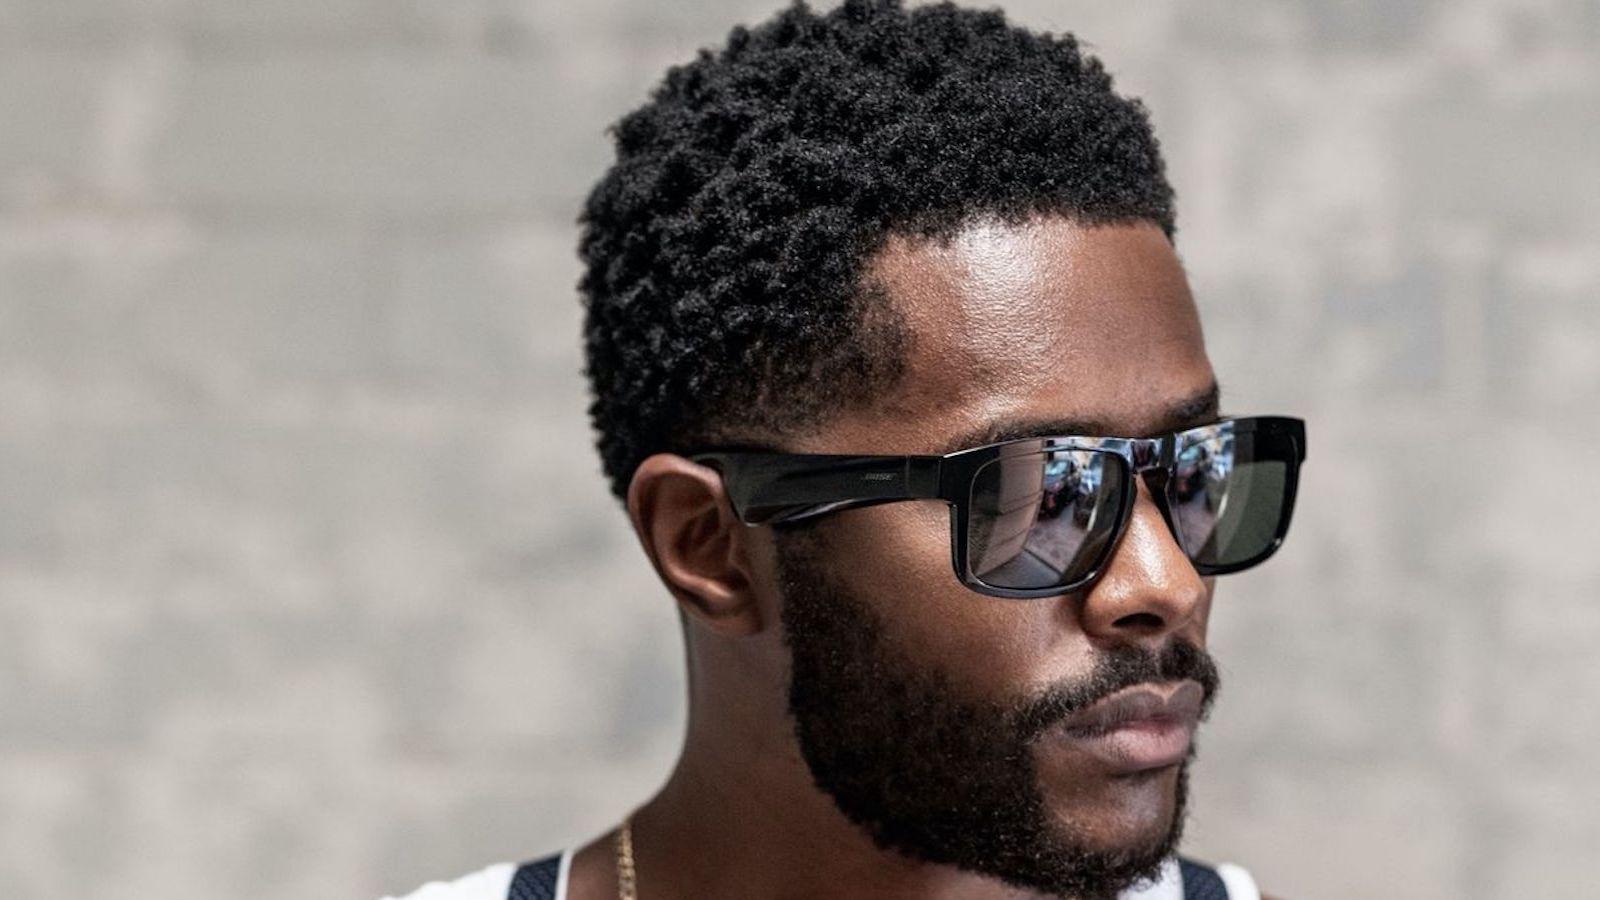 Bose Frames Tenor audio sunglasses feature Bose Open Ear Audio technology